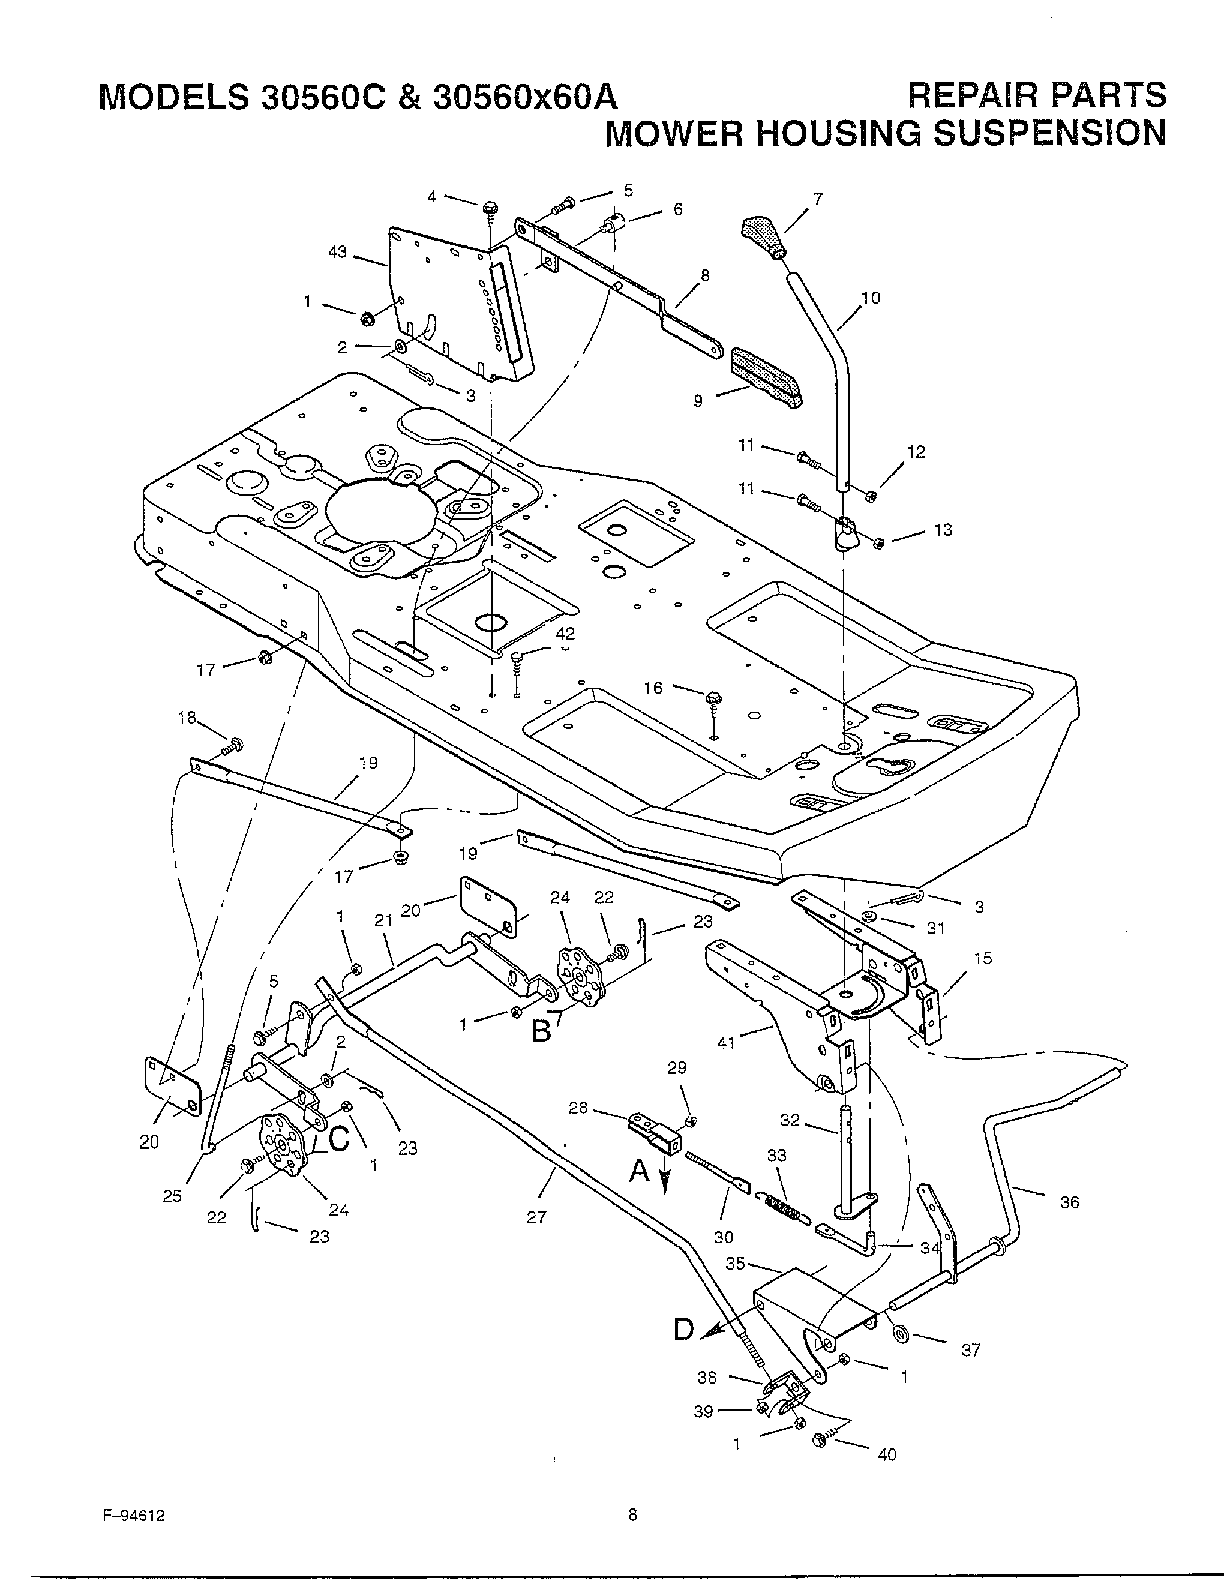 Mtd Riding Lawn Mower Wiring Diagram Manual Guide